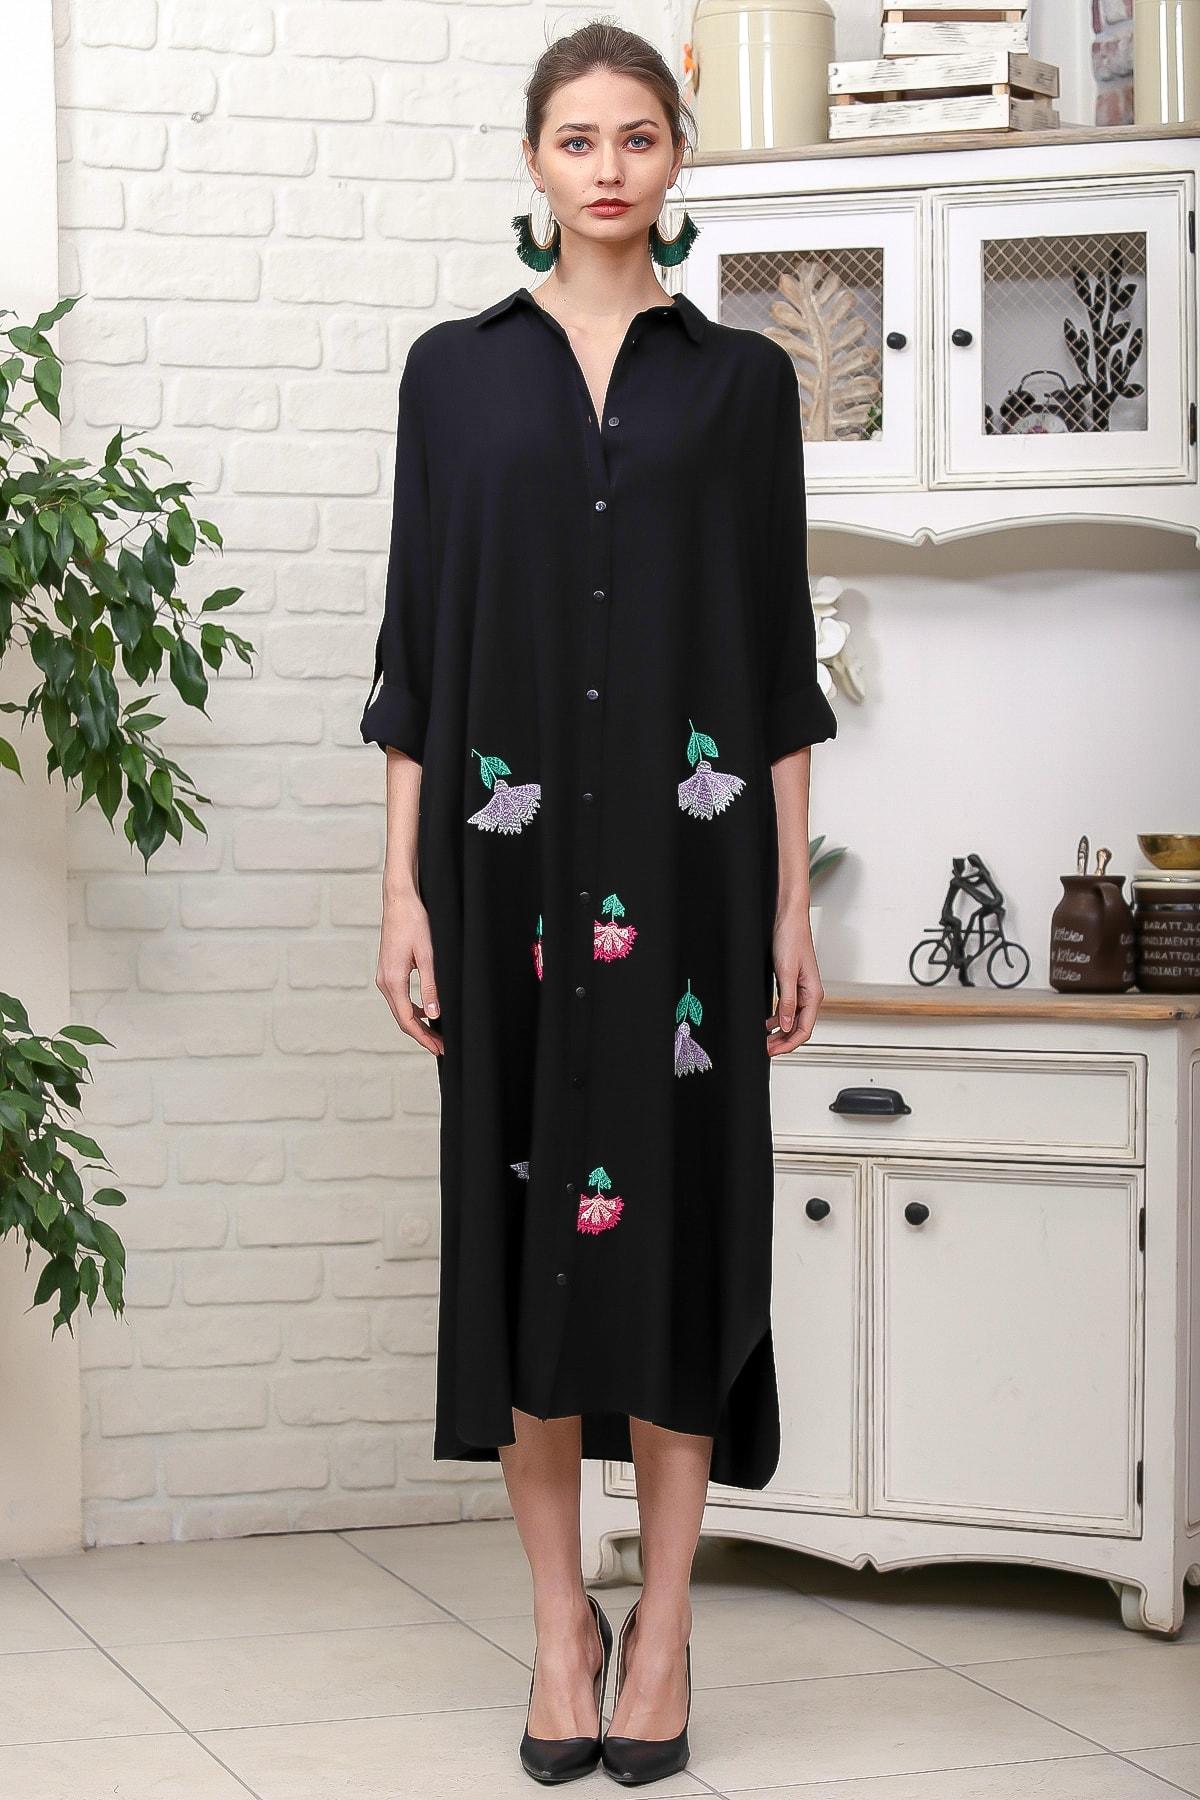 Chiccy Kadın Siyah Karanfil Nakışlı Sırt Detaylı Düğmeli Salaş Gömlek Elbise M10160000EL95923 3